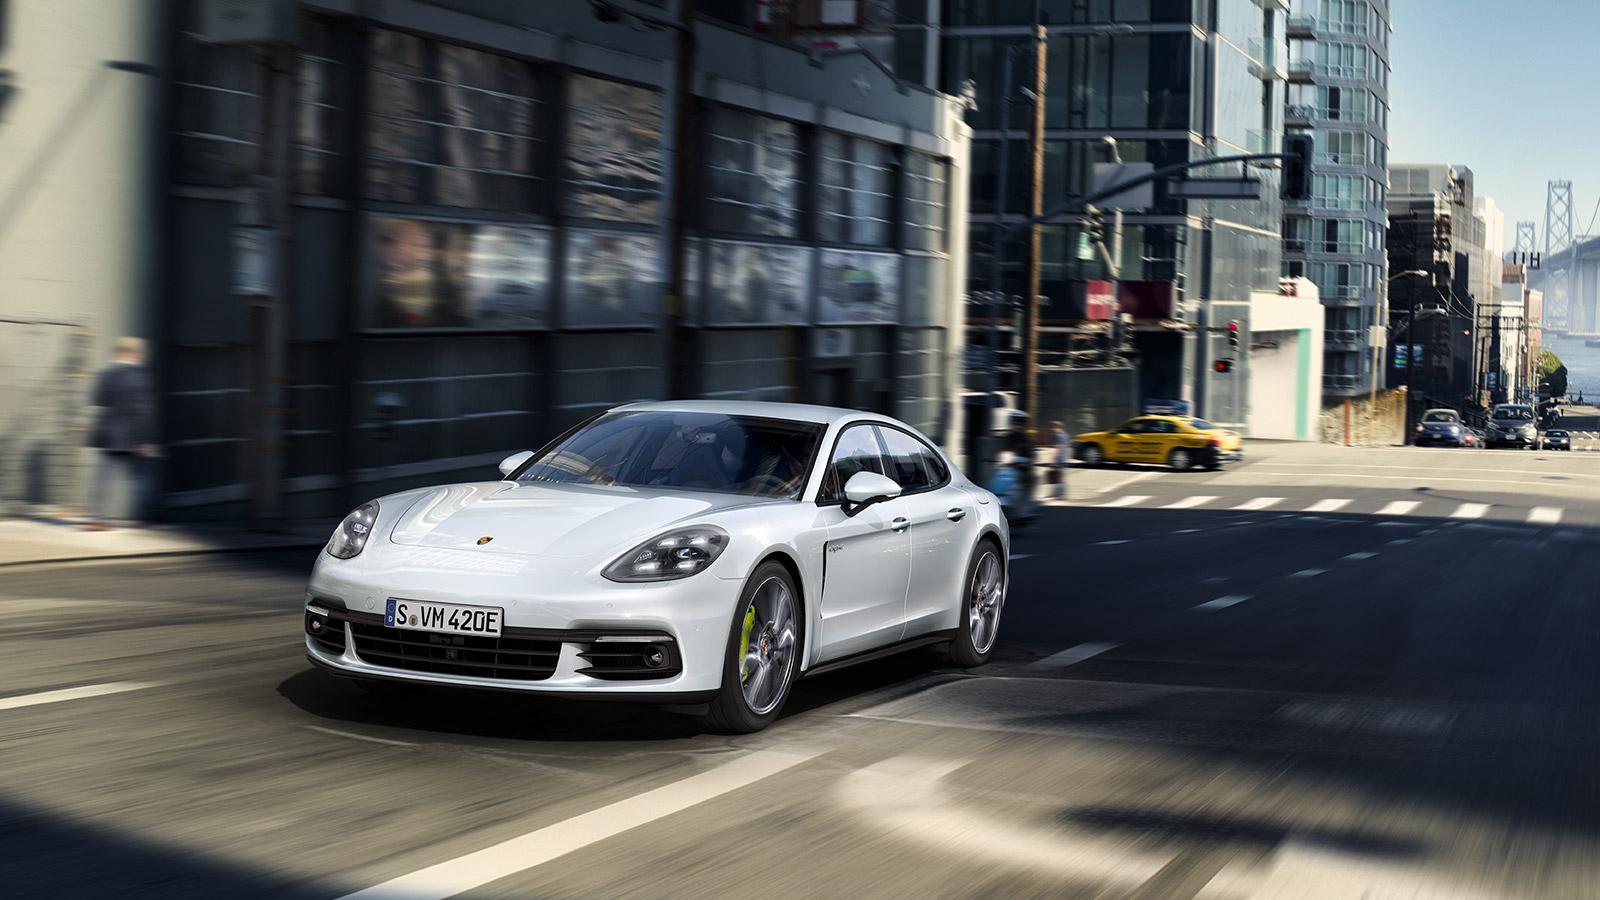 Porsche Driving modes